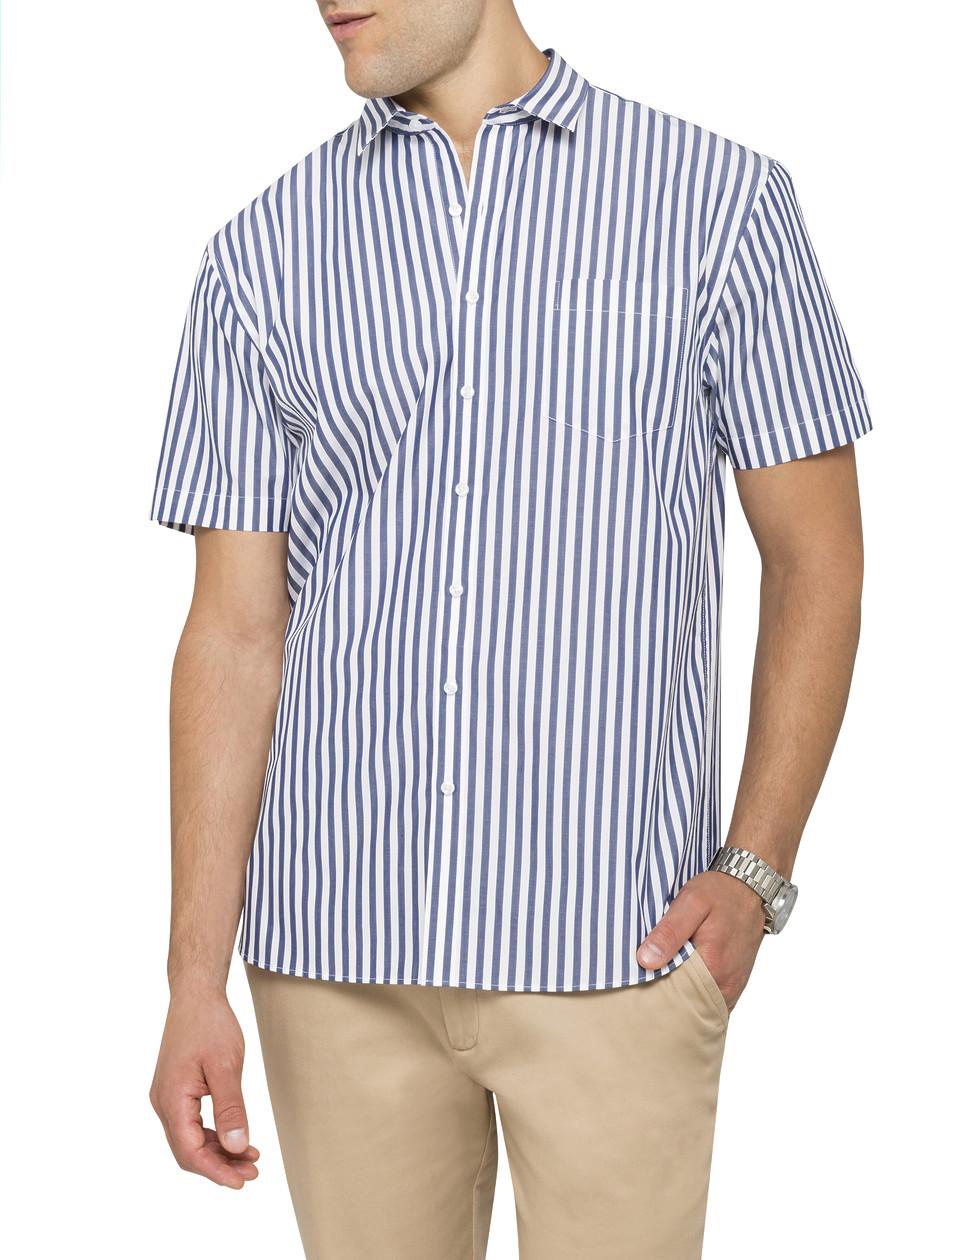 68038d27d9eb9 Van Heusen    Casual Shirts    Mens Casual Short Sleeve Shirt Summer Stripe.  Product Image · Image 1 Image 2